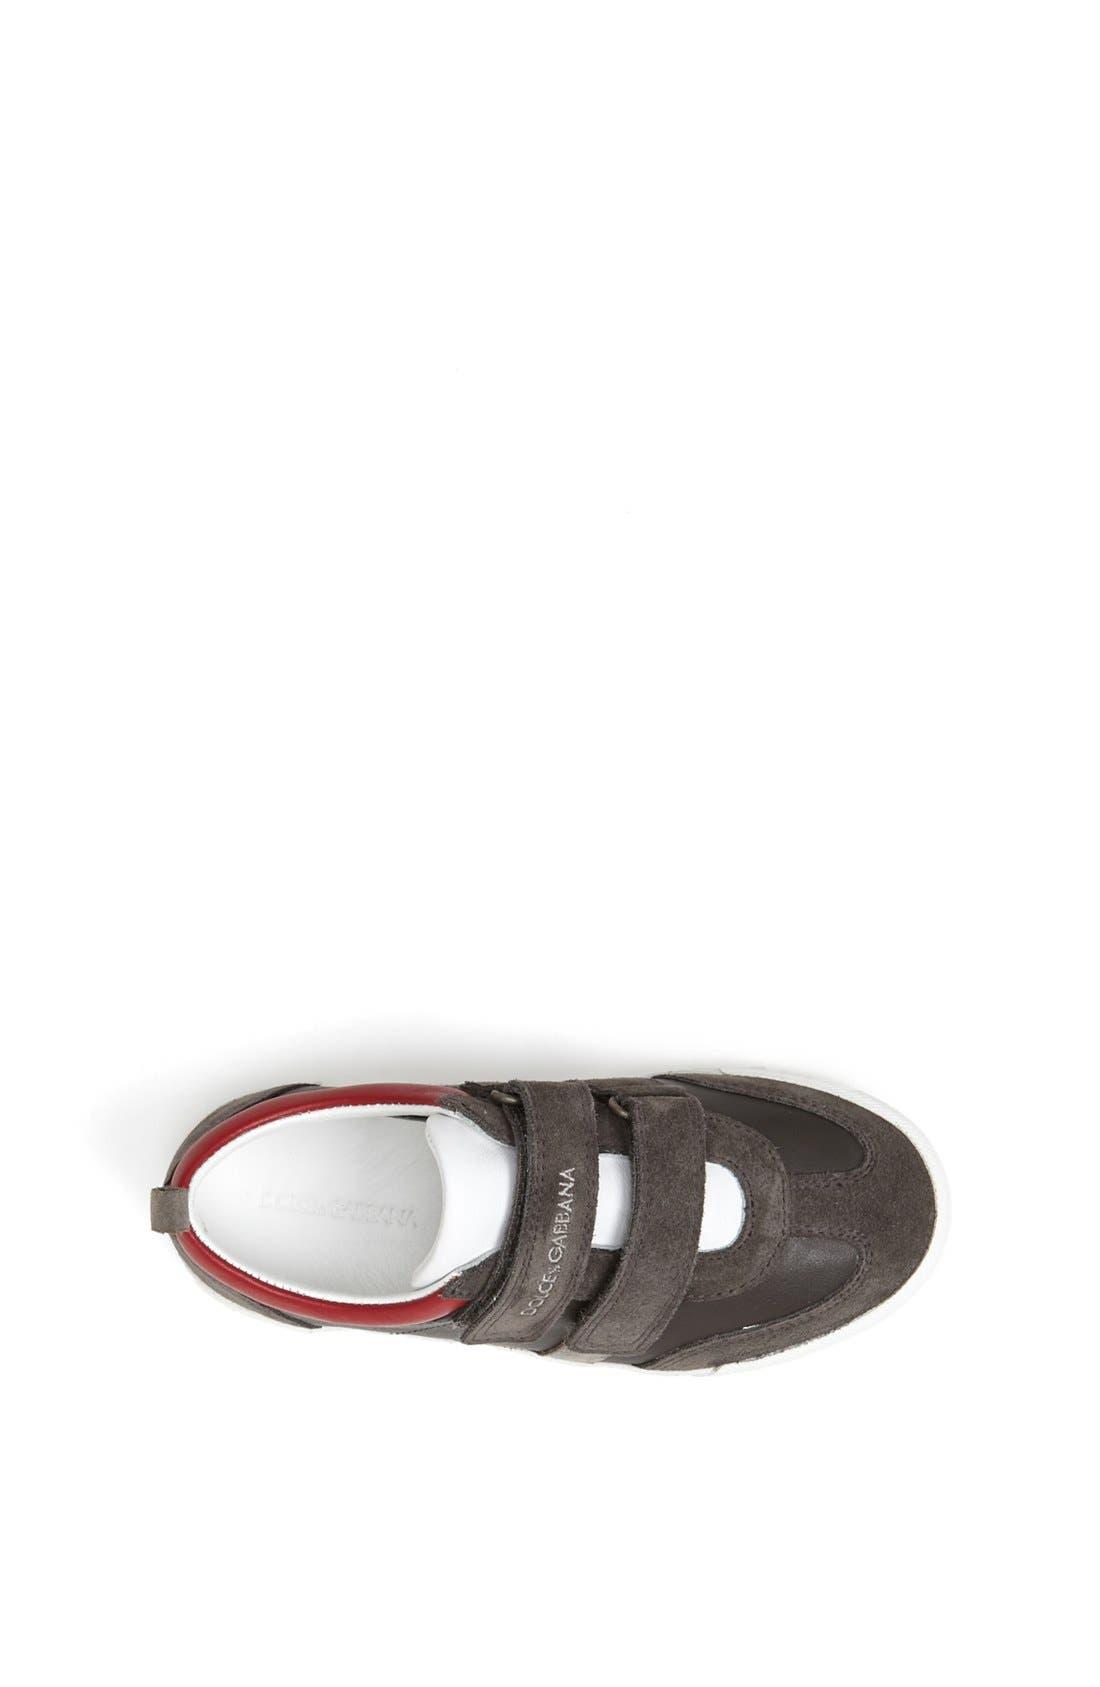 Alternate Image 3  - Dolce&Gabbana Sneaker (Toddler, Little Kid & Big Kid)